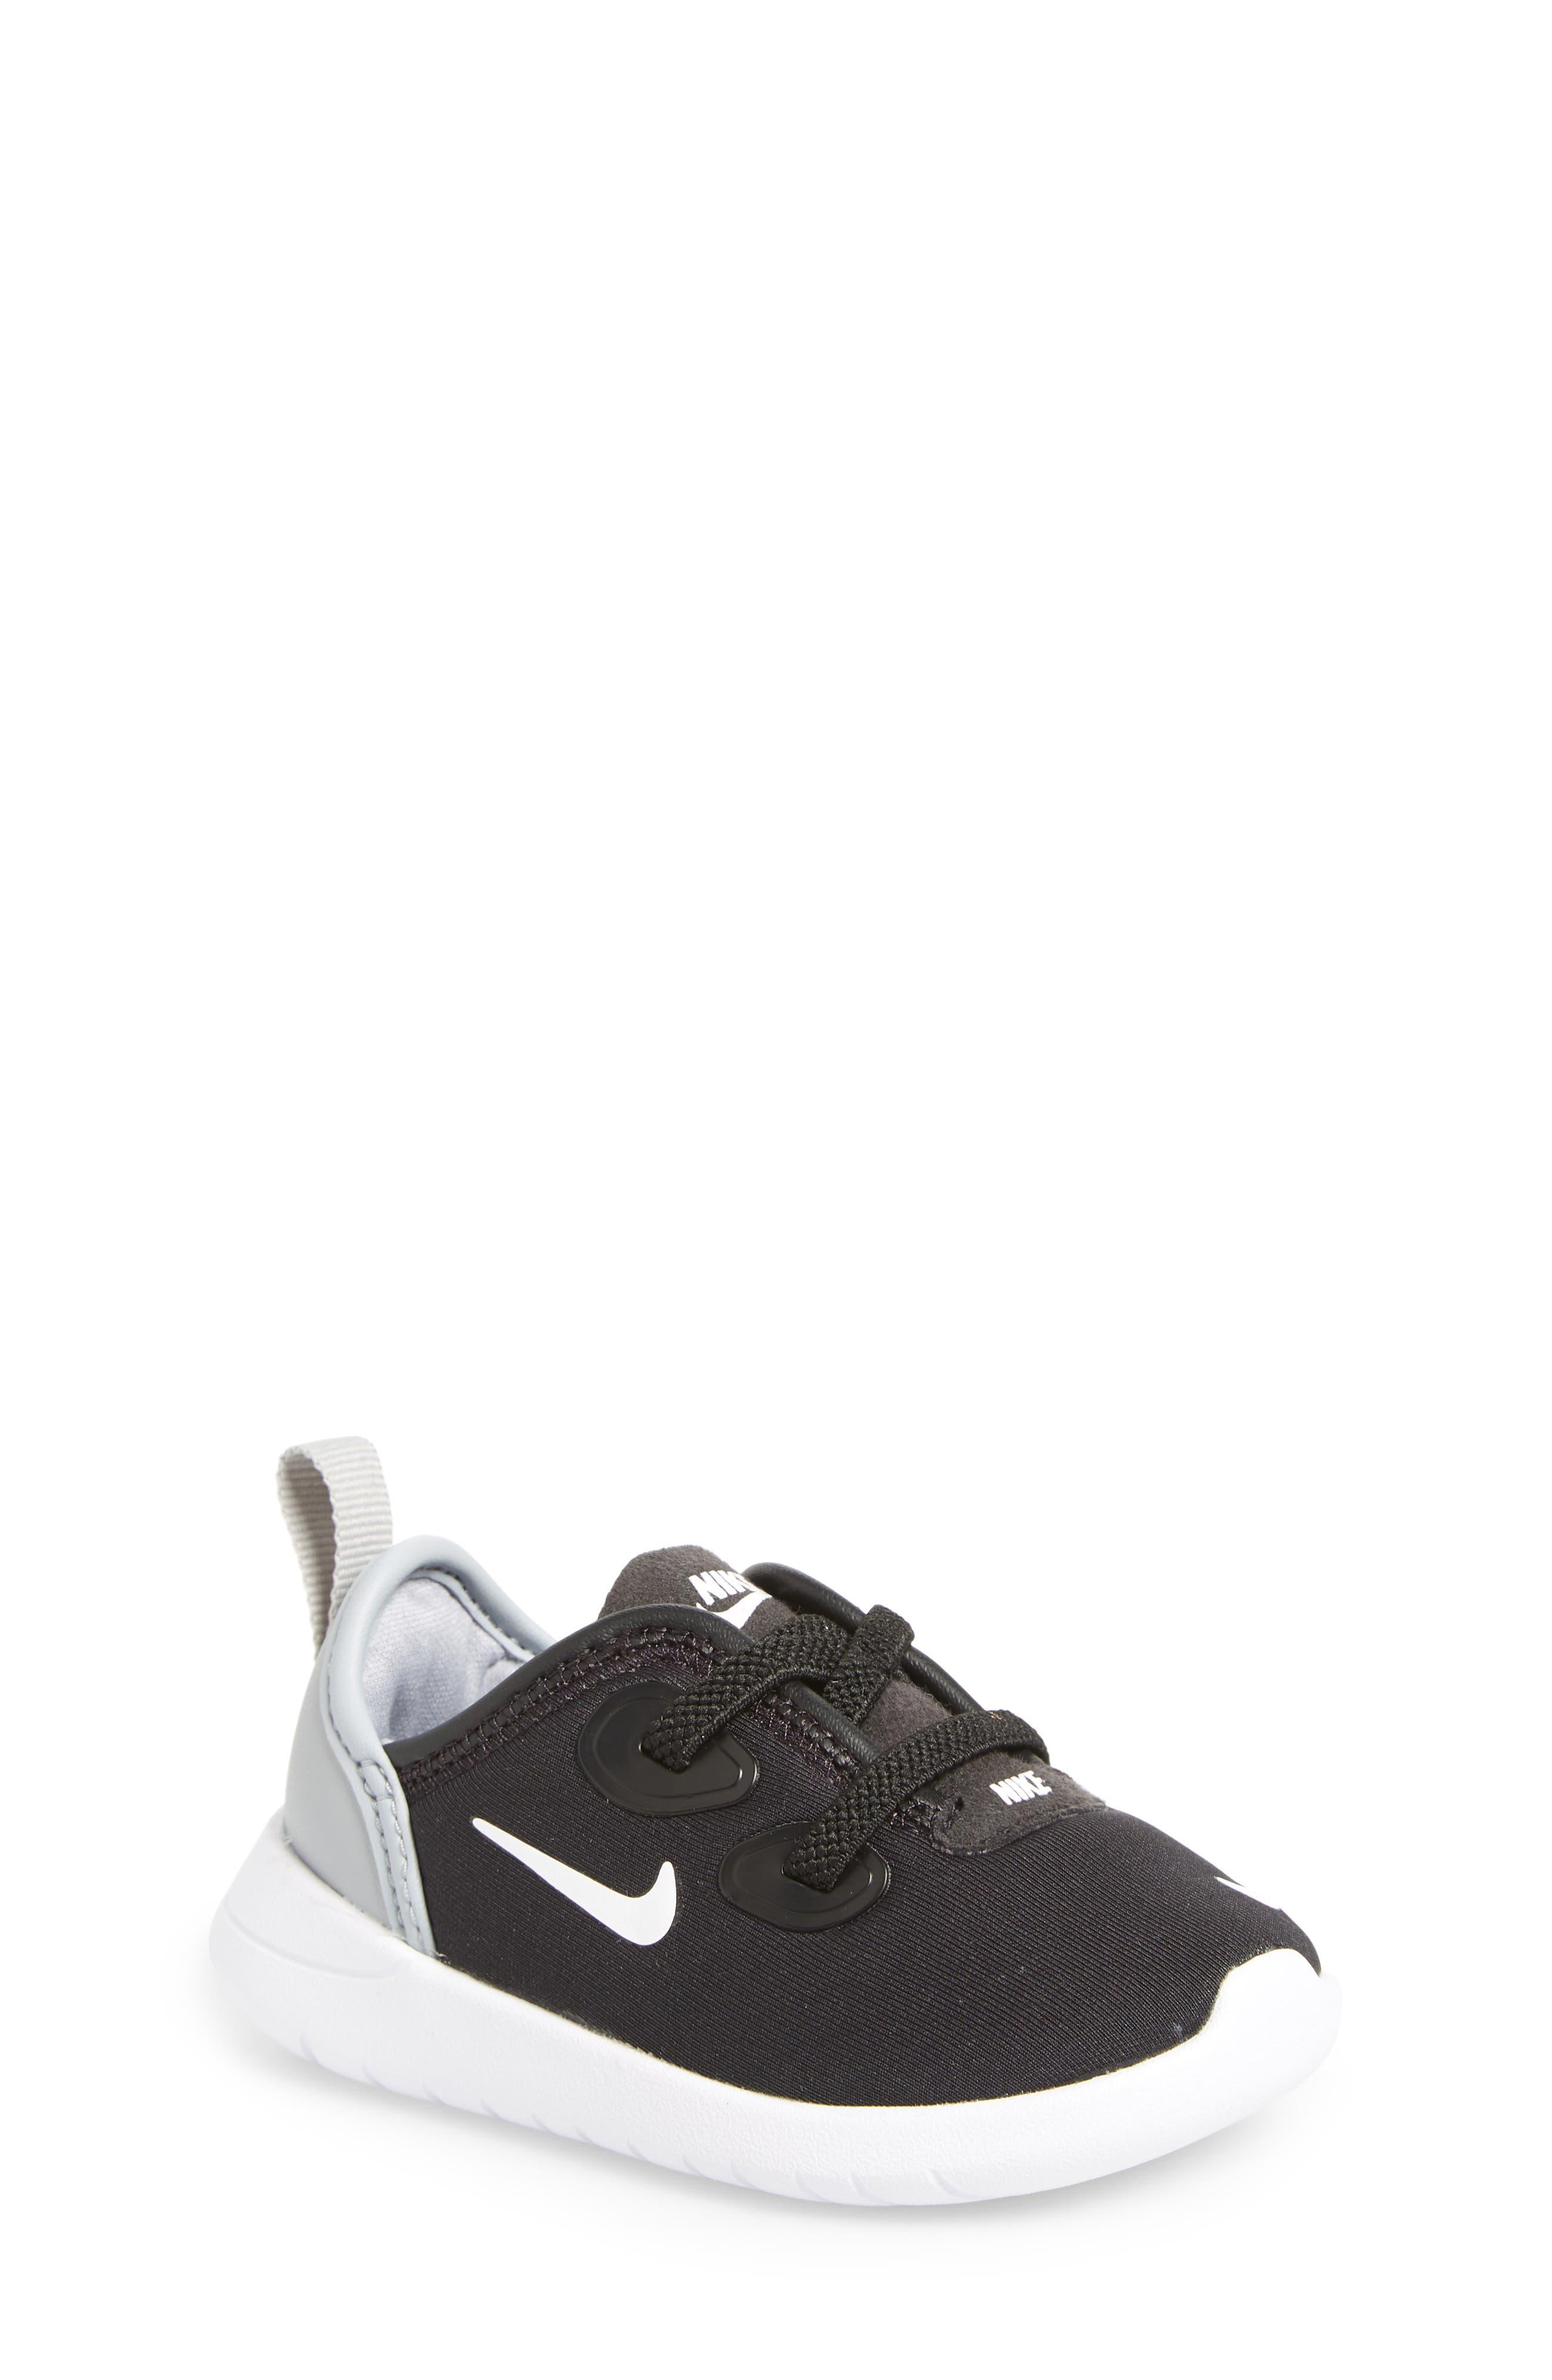 Hakata Sneaker,                         Main,                         color, Black/ White/ Wolf Grey